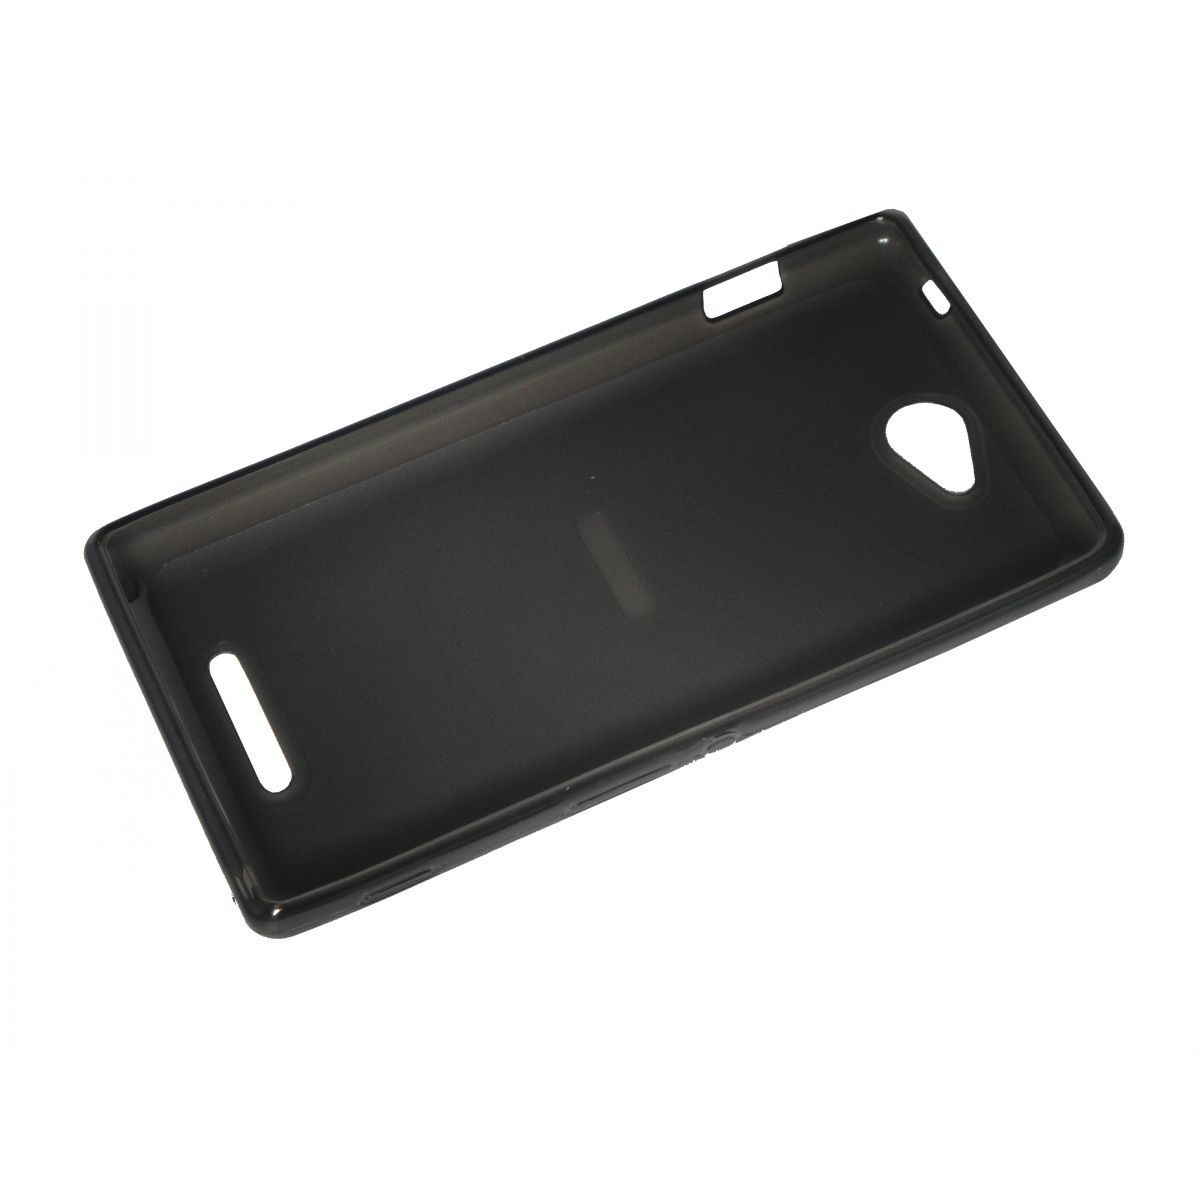 Capa de Tpu para Xperia C C2304 C2305 S39H  + Pelicula Grafite